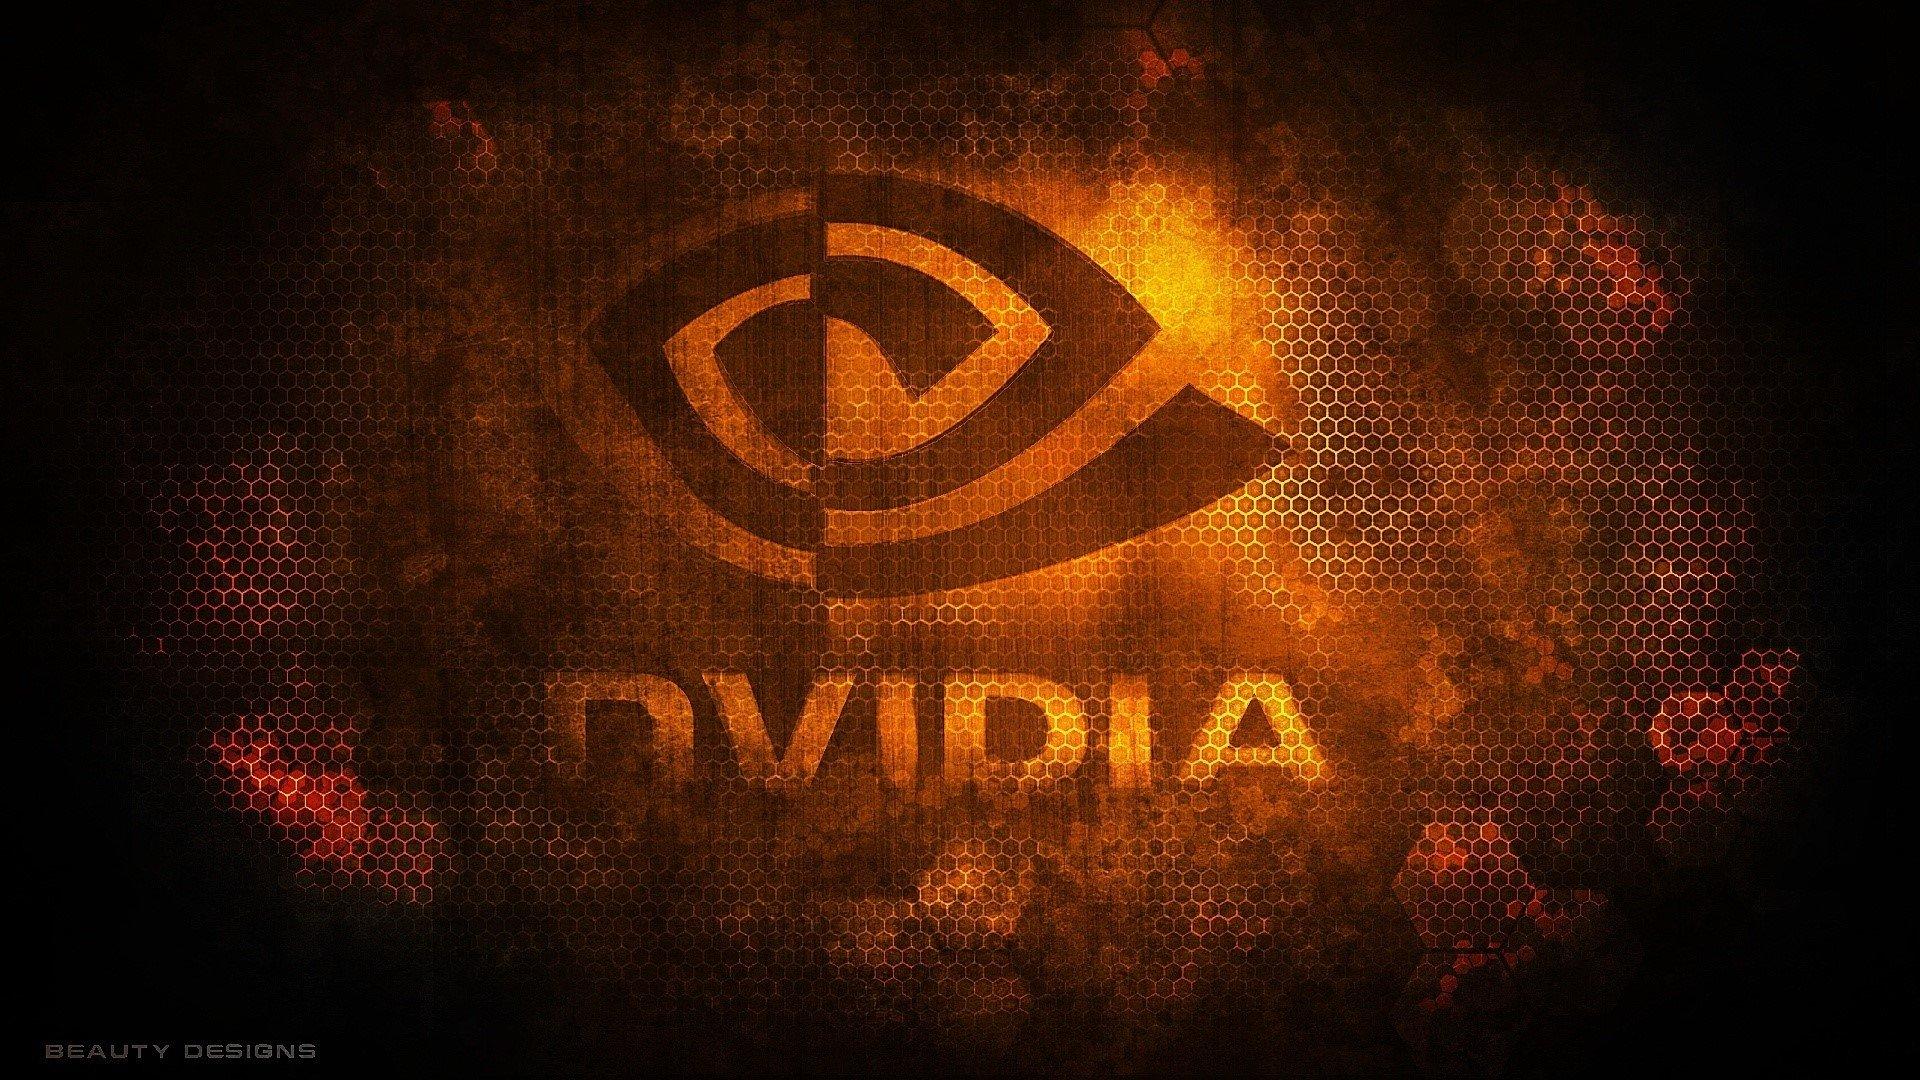 Fondo de pantalla de Logo de Nvidia Imágenes